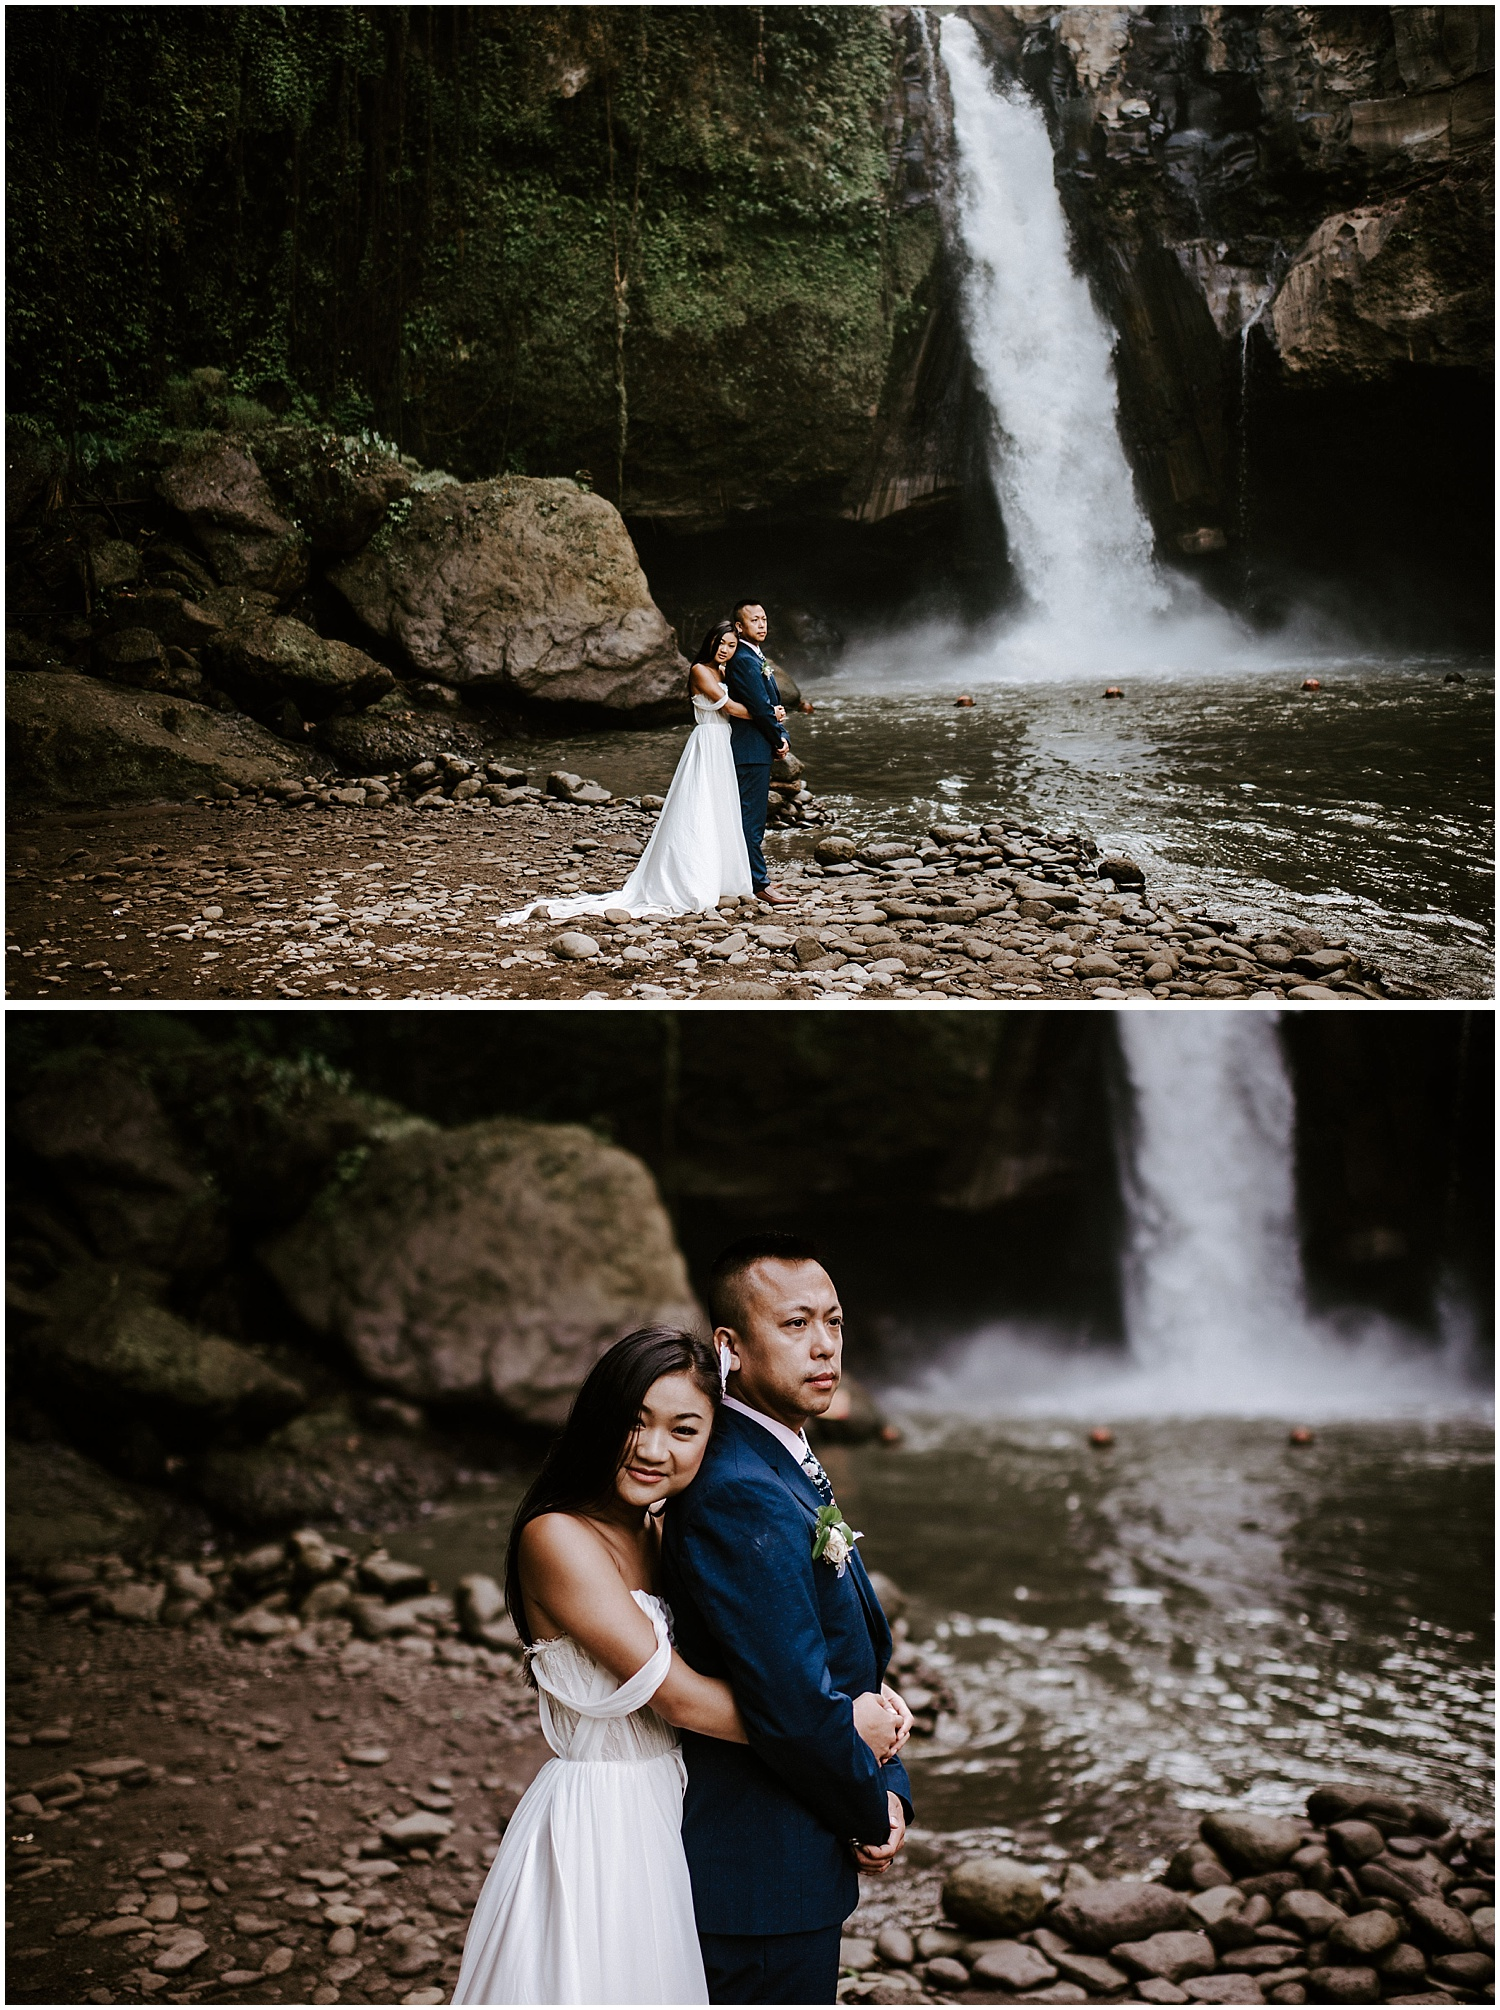 ubud bali waterfall elopement photos at tegenungan waterfall